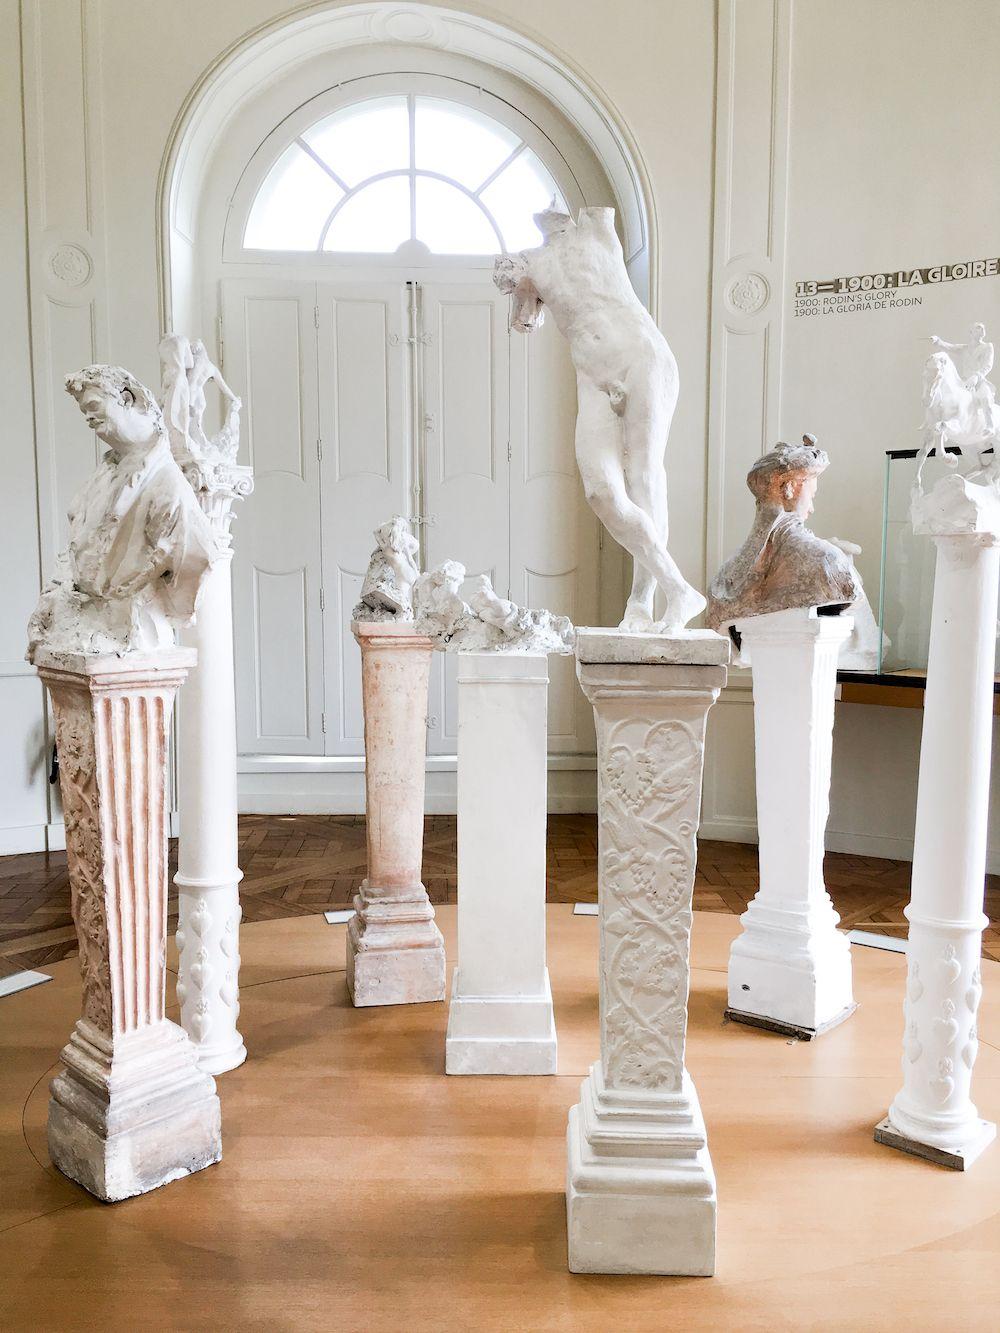 Sculptures at Musée Rodin